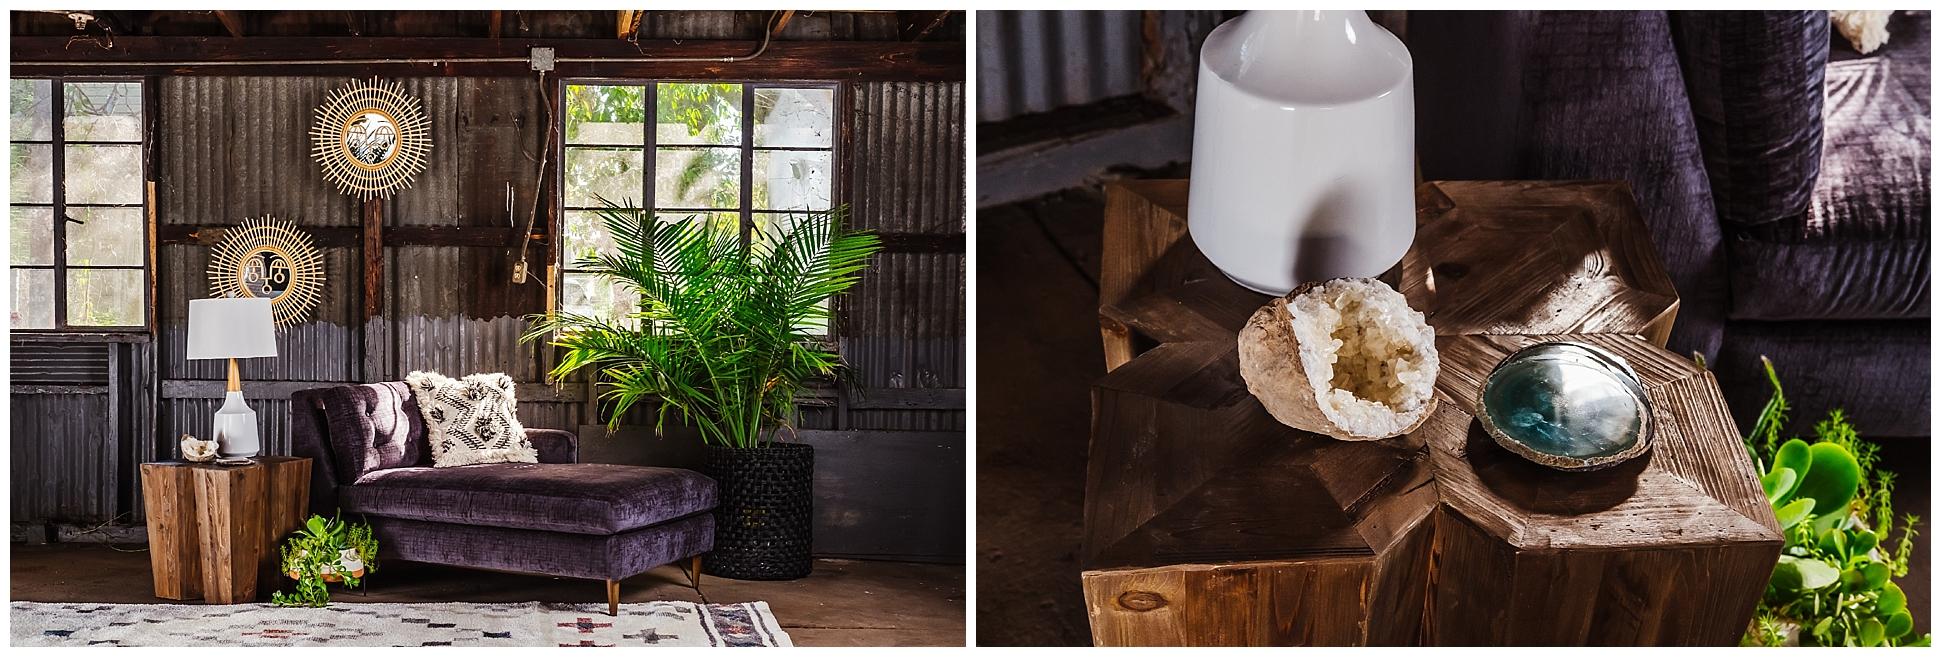 sophisticated-fun-colorful-interior design-headshots-inspiration_0032.jpg